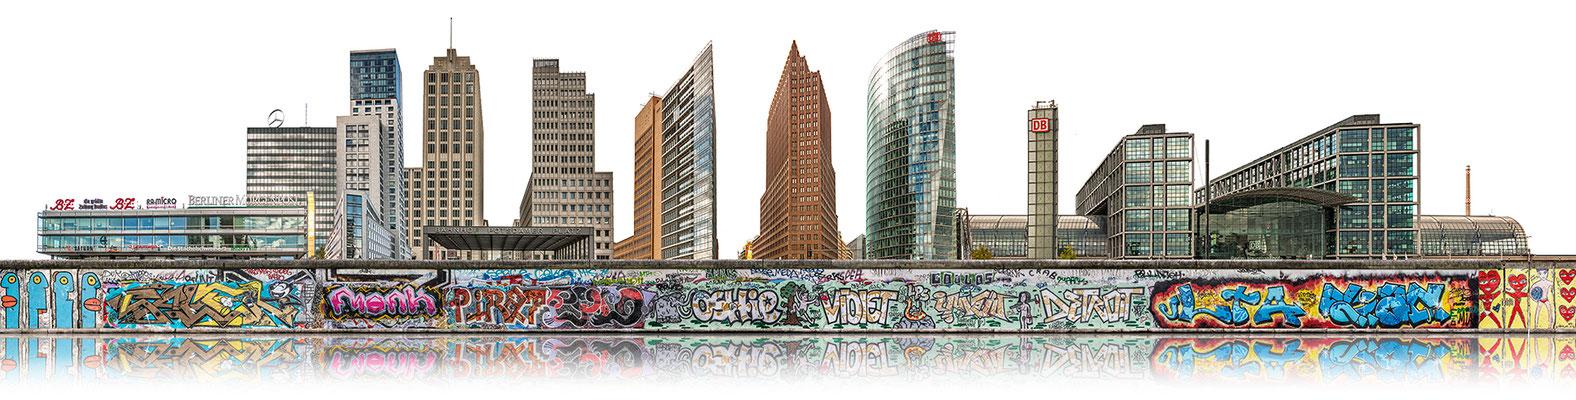 Berliner Mauer 2c  ·  230 x 60 cm · Leinwand auf Keilrahmen: € 1.090,- · Aludibond: € 1.370,- · Acrylglas auf Aludibond: € 1.670,-  · © Stefan Korff